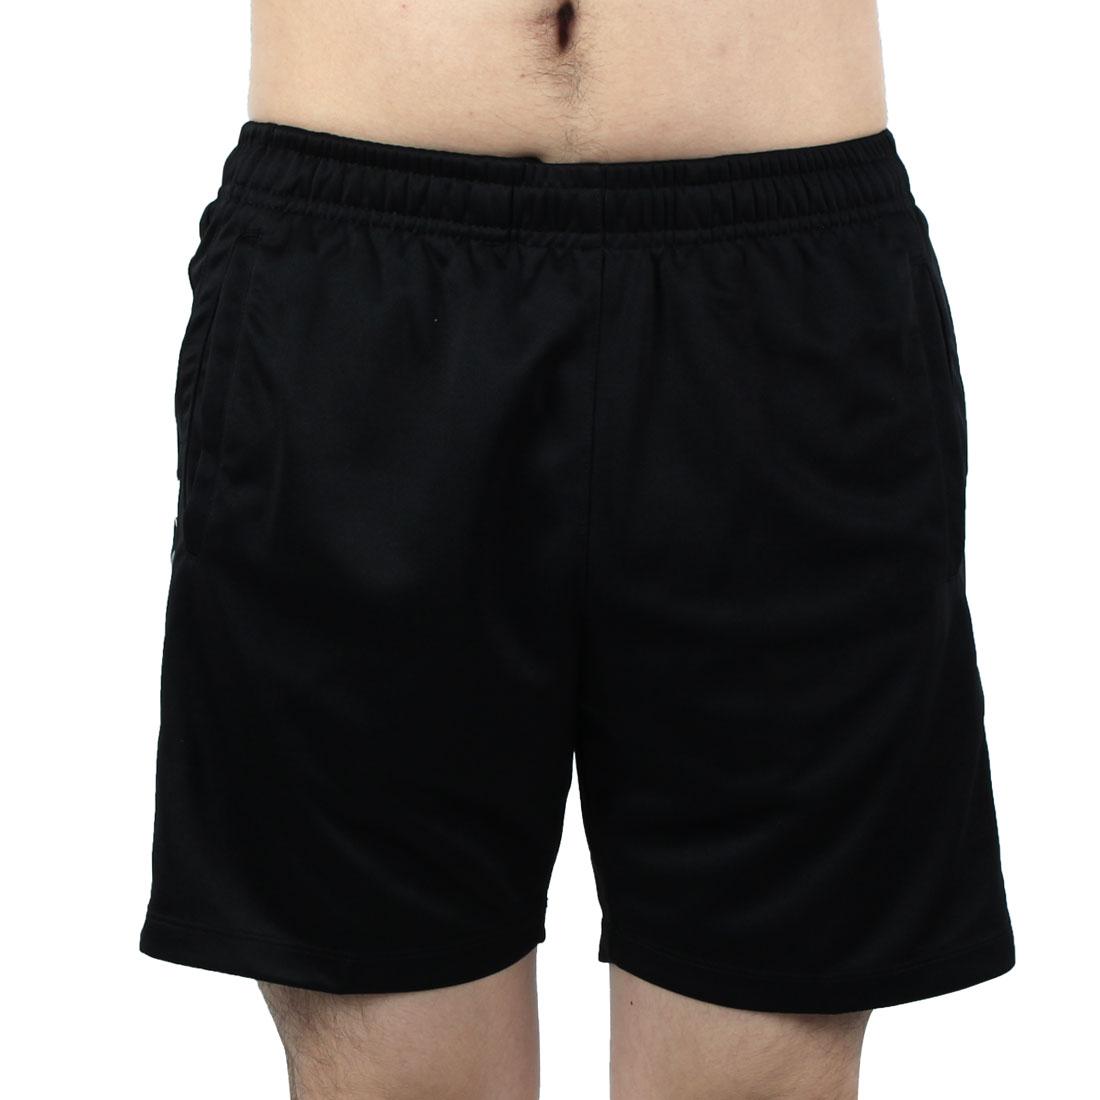 Outdoor Baseball Basketball Pocket Breathable Pantie Men Sports Shorts Black W33